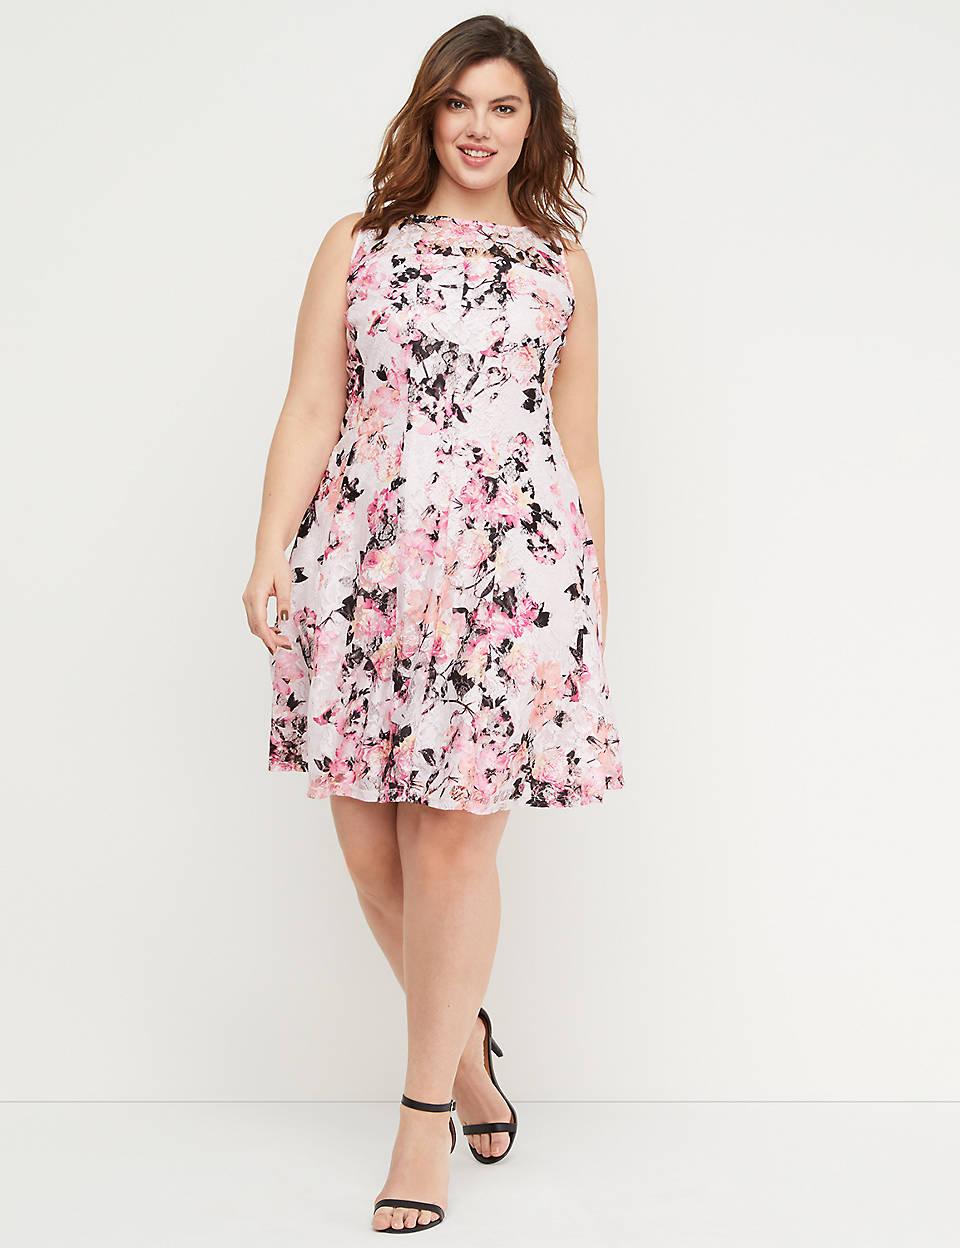 46538dffc4e Floral Lace Fit   Flare Dress